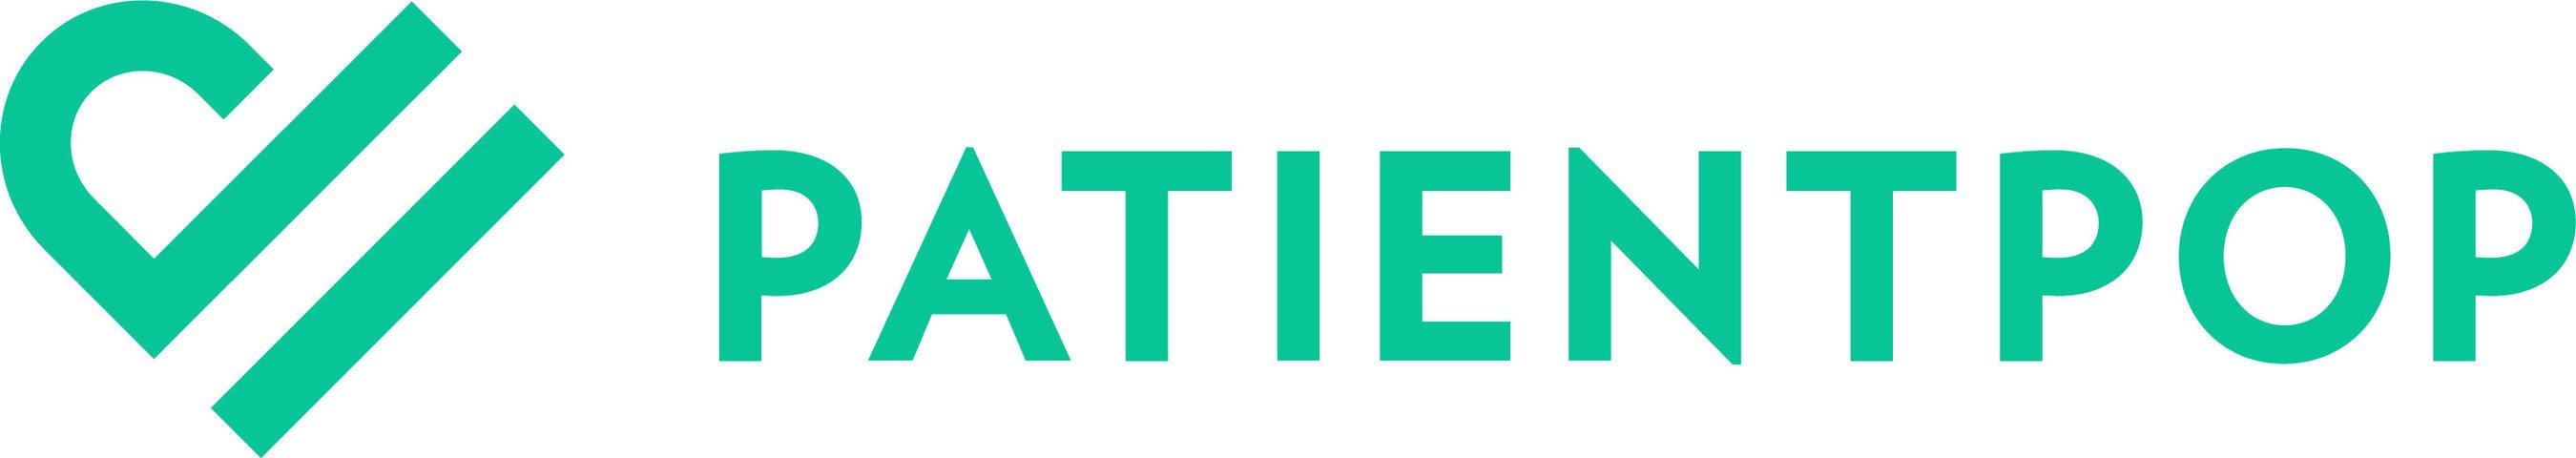 PatientPop_Logo1